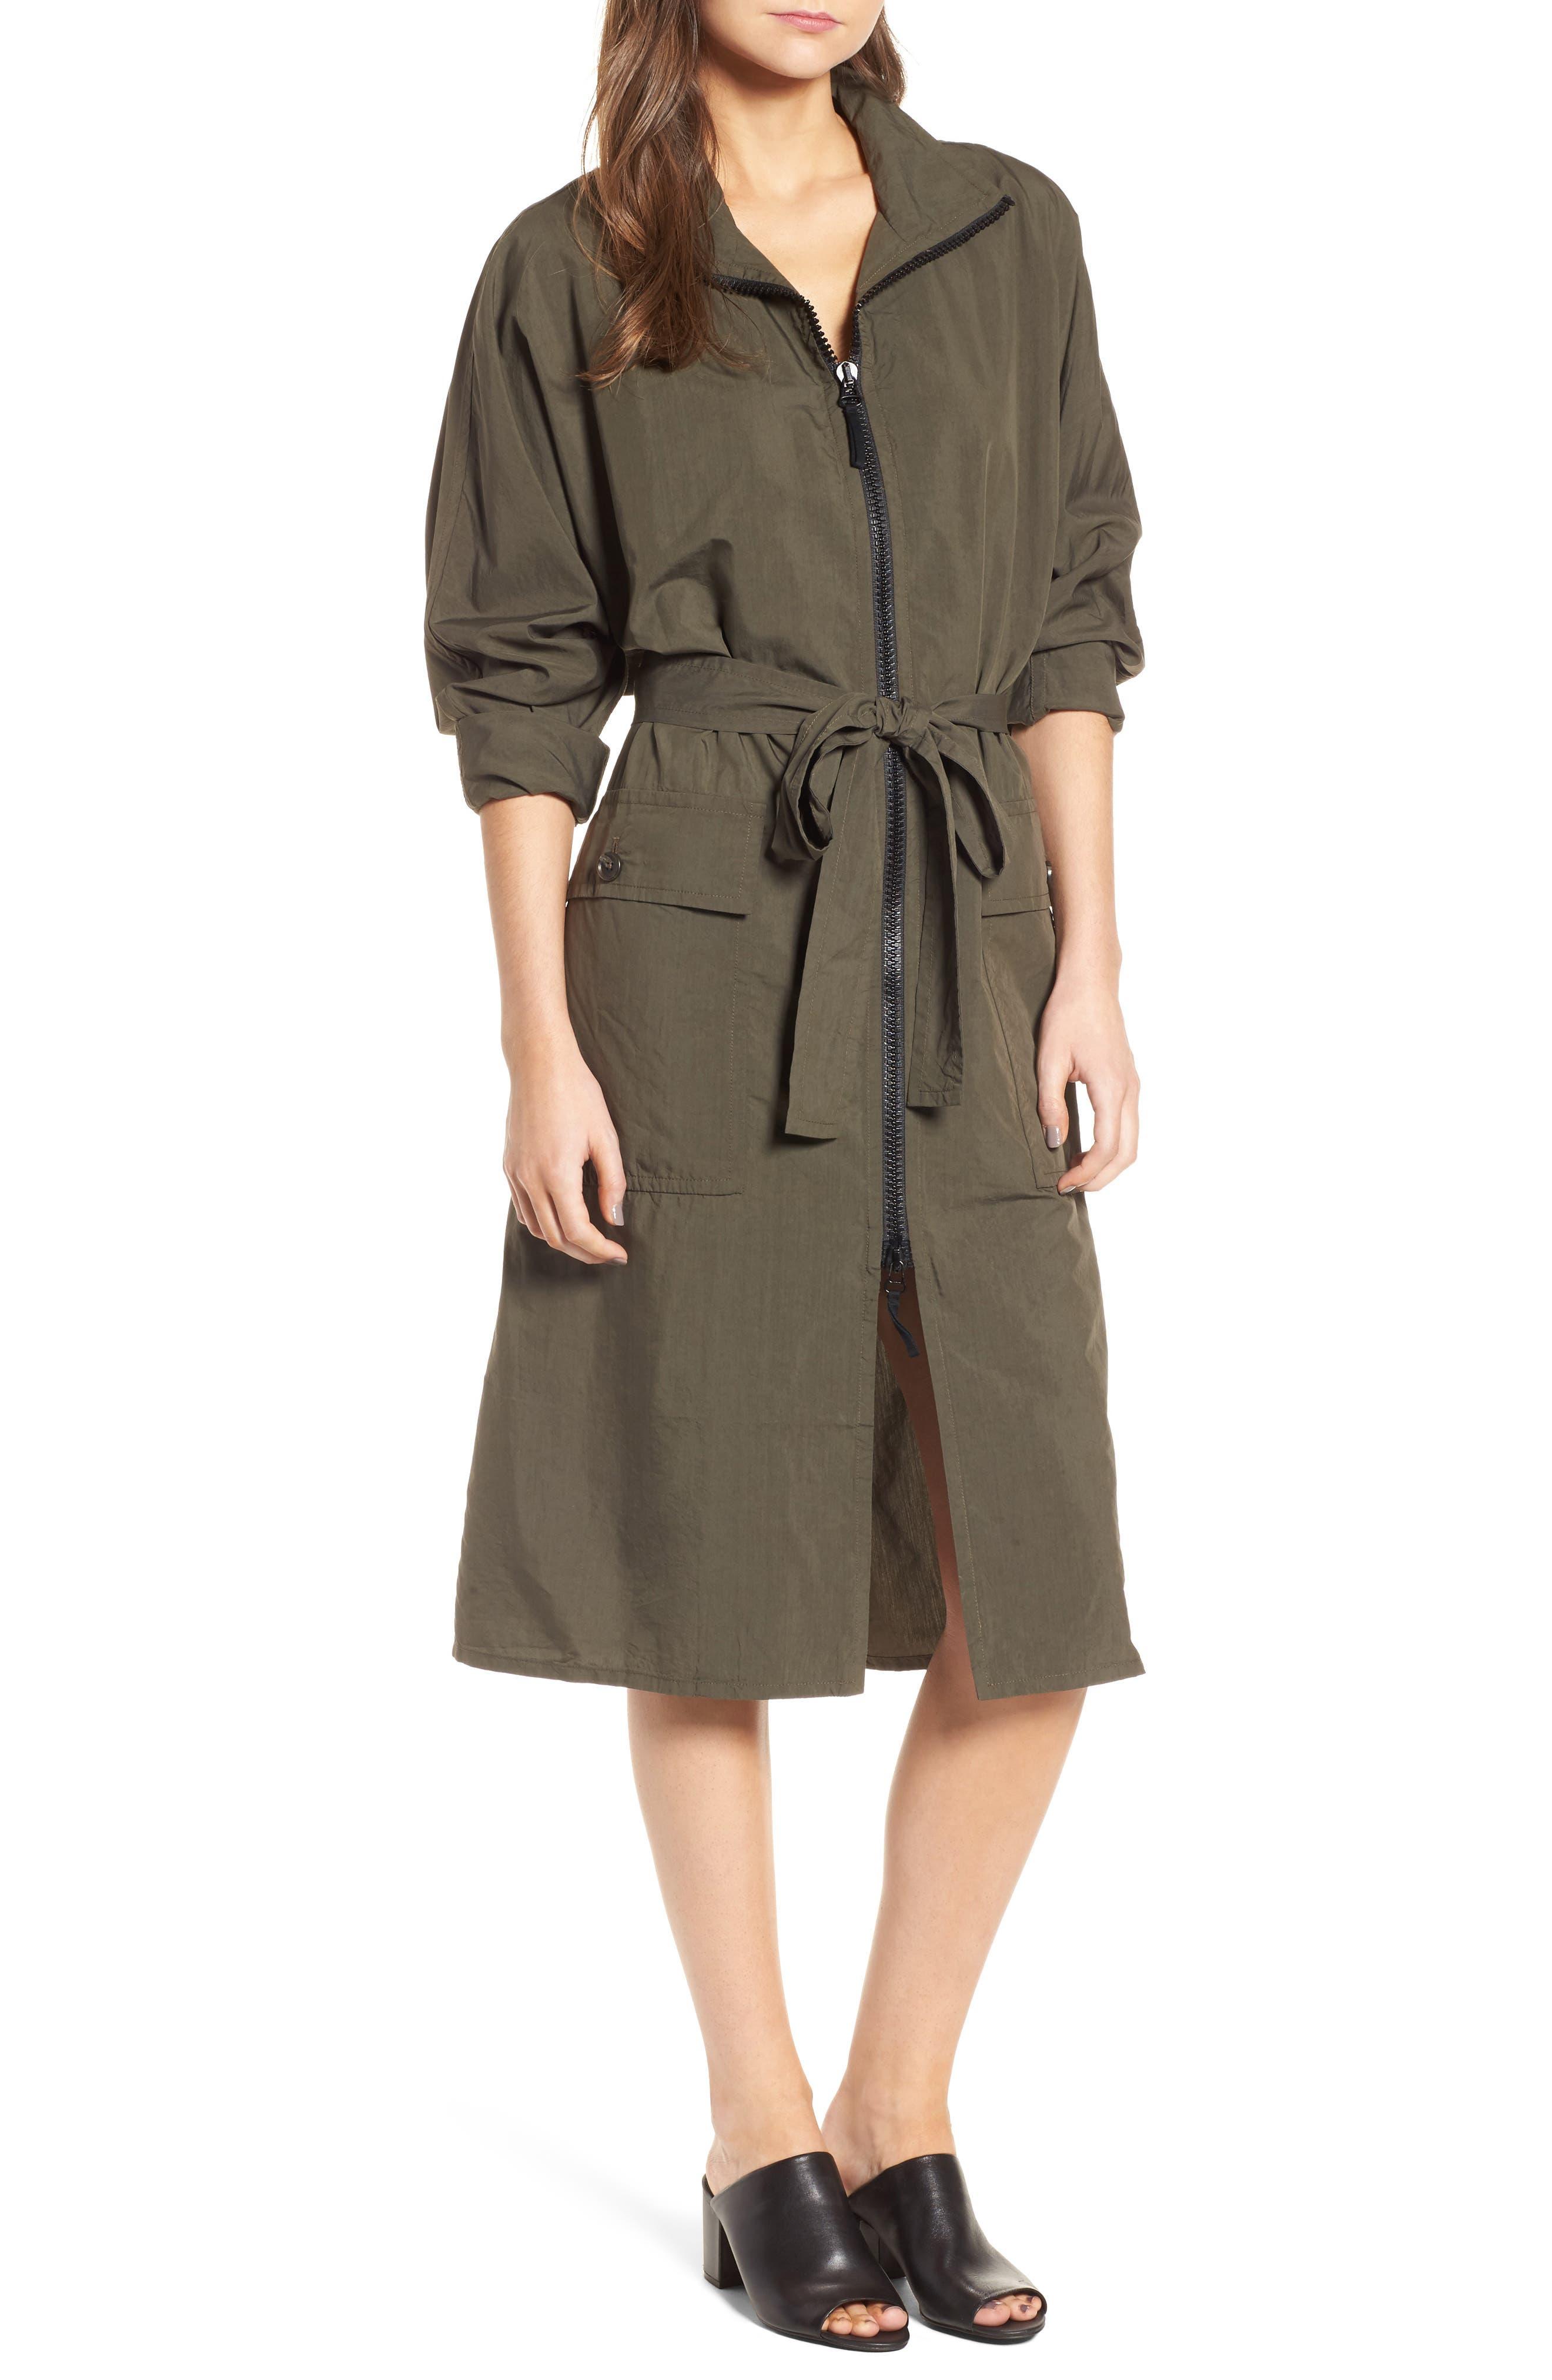 Main Image - James Perse Zip Front Jacket Dress